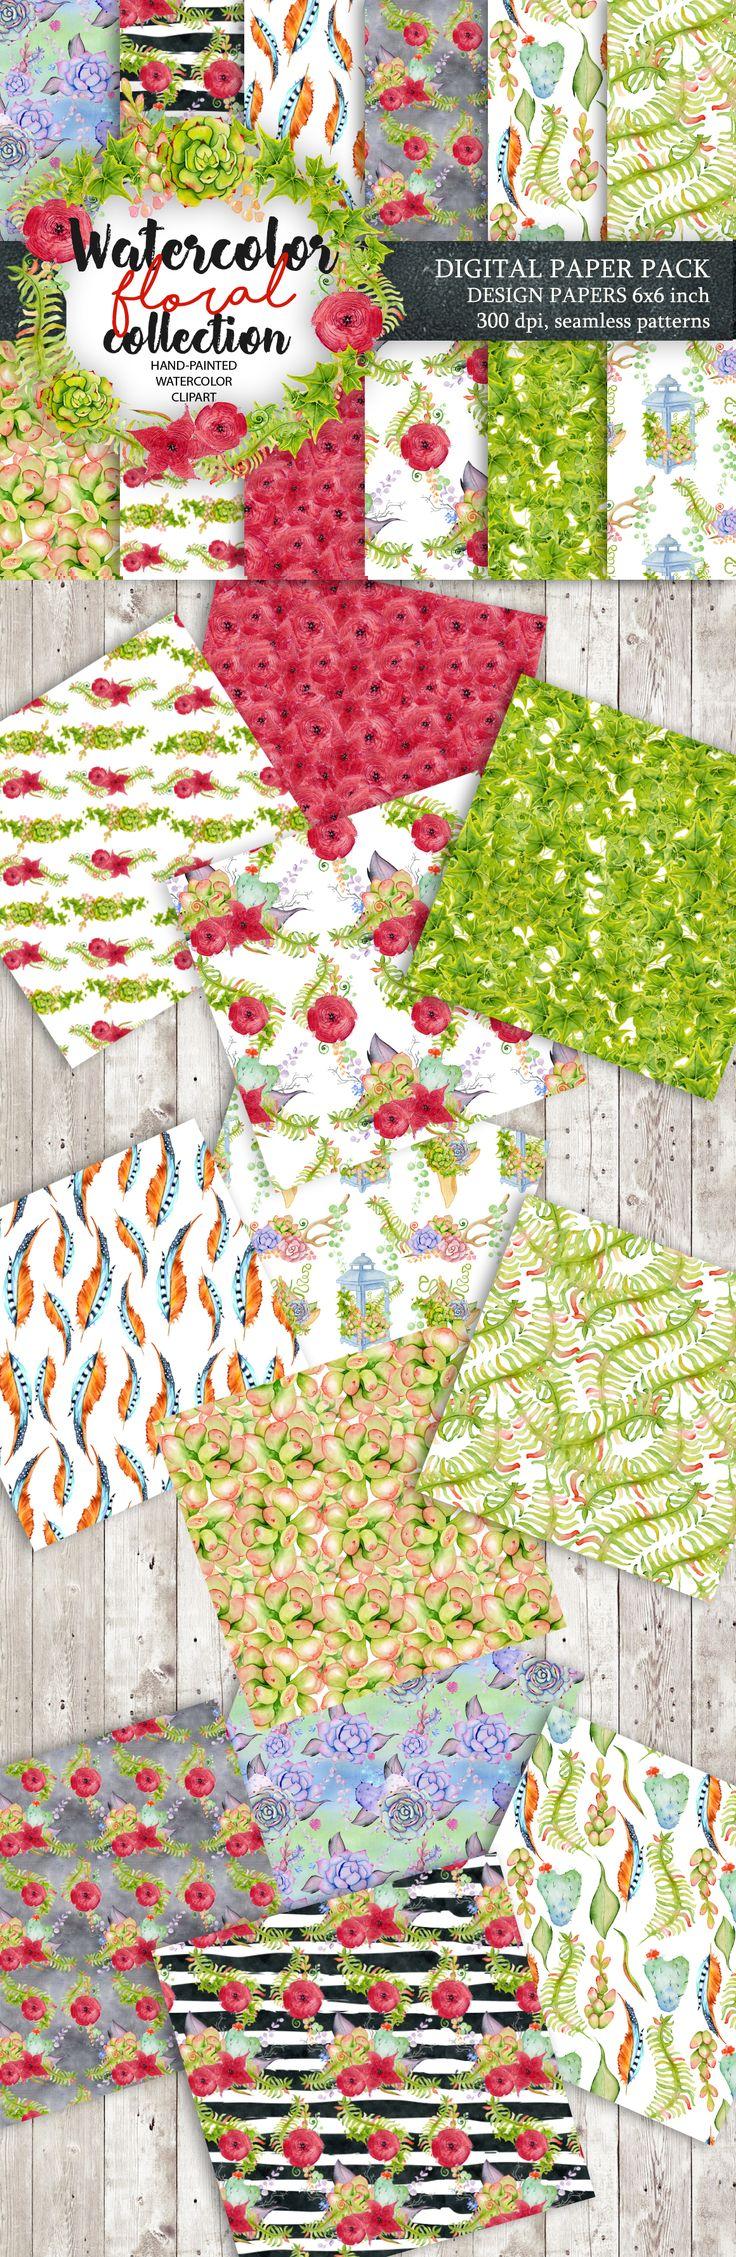 Digital Paper Pack, Waterclor seamless pattern, Watercolor Backgrounds, Floral Scrapbook Paper, Wedding Floral, DIY Pack, Instand download